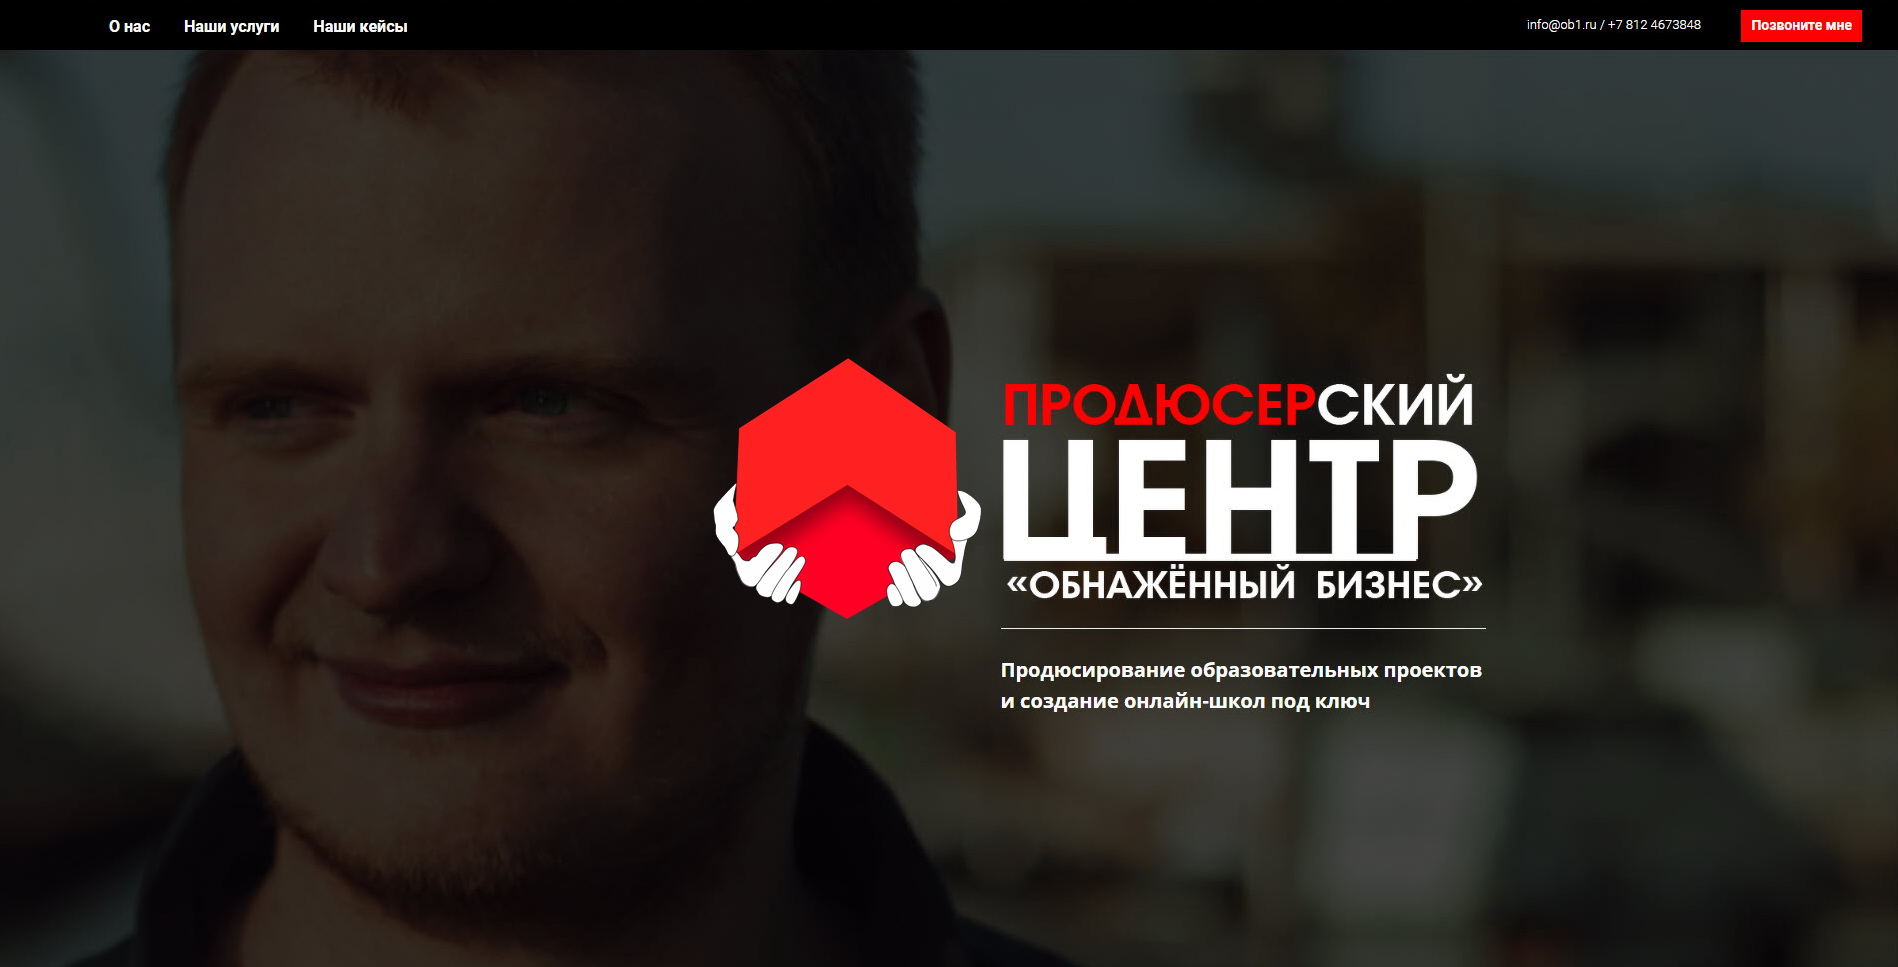 "Логотип для продюсерского центра ""Обнажённый бизнес"" фото f_3715ba55bb8cde21.jpg"